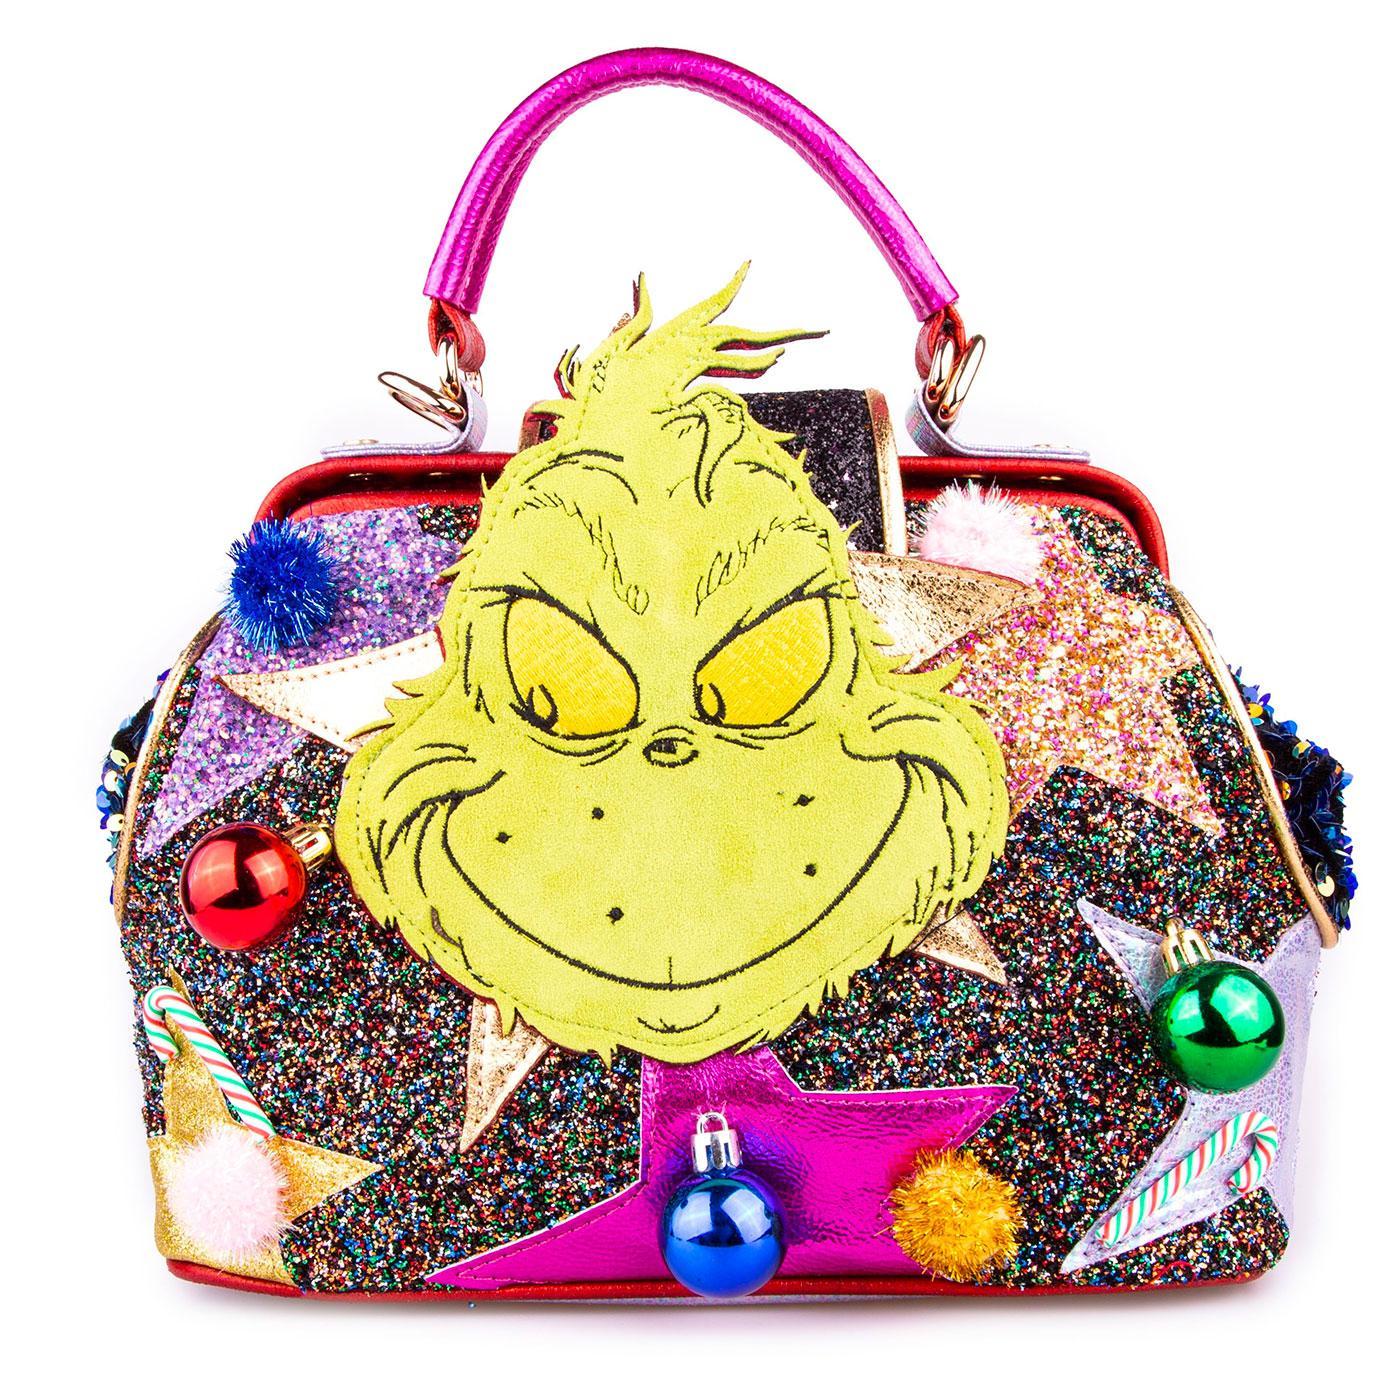 IRREGULAR CHOICE x GRINCH Vengeful & Mean Bag